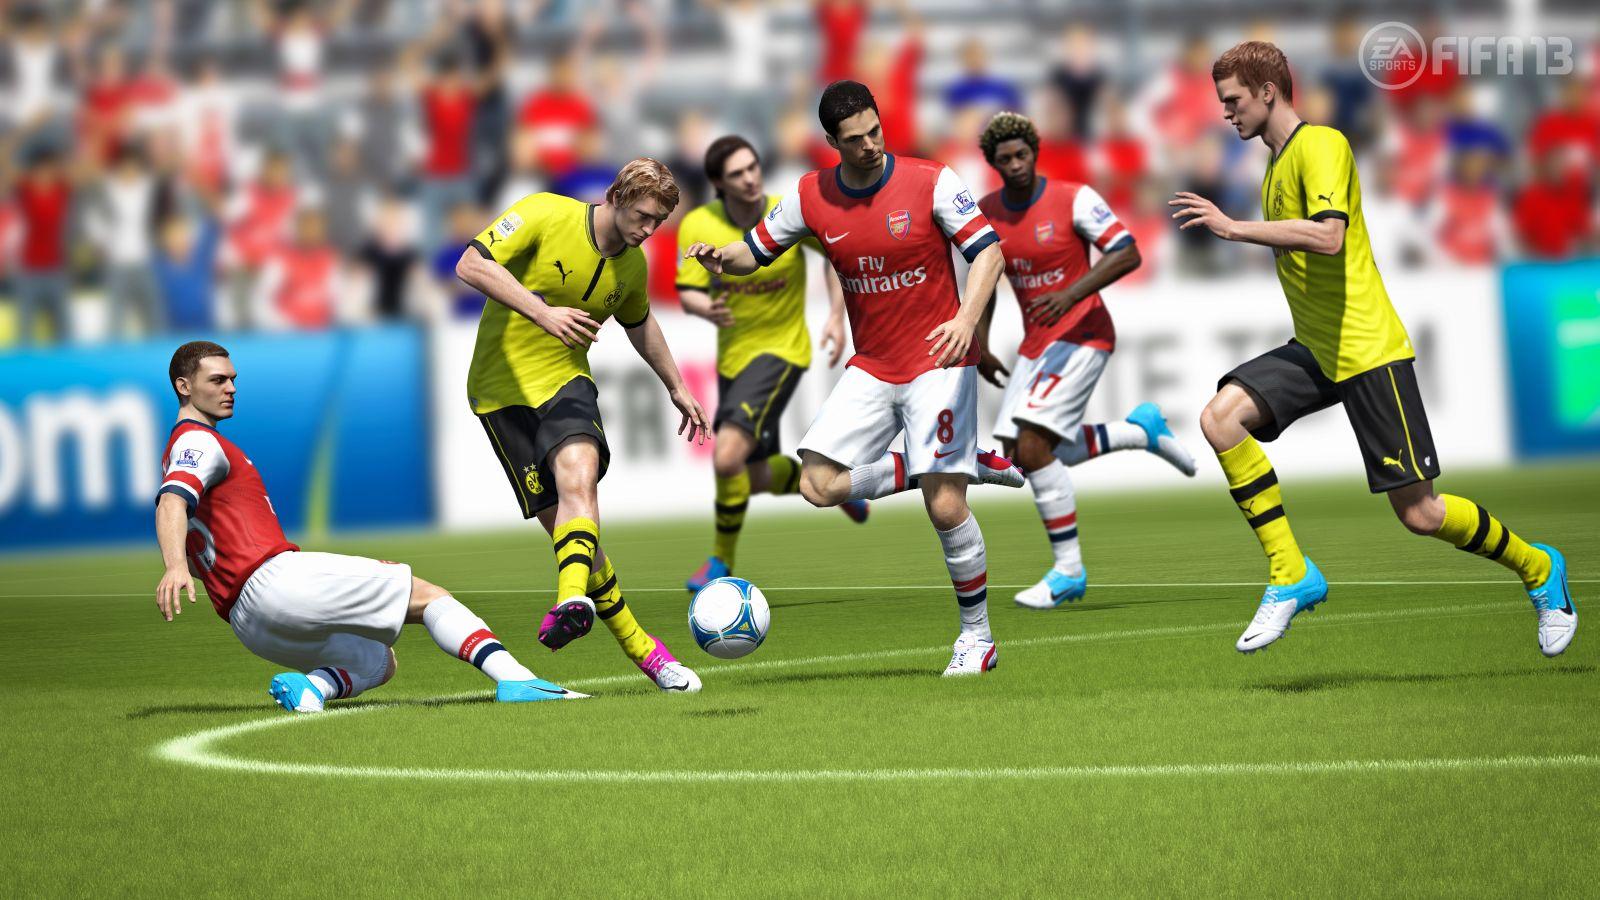 FIFA 13: dojmy z prezentace z Edenu 68890